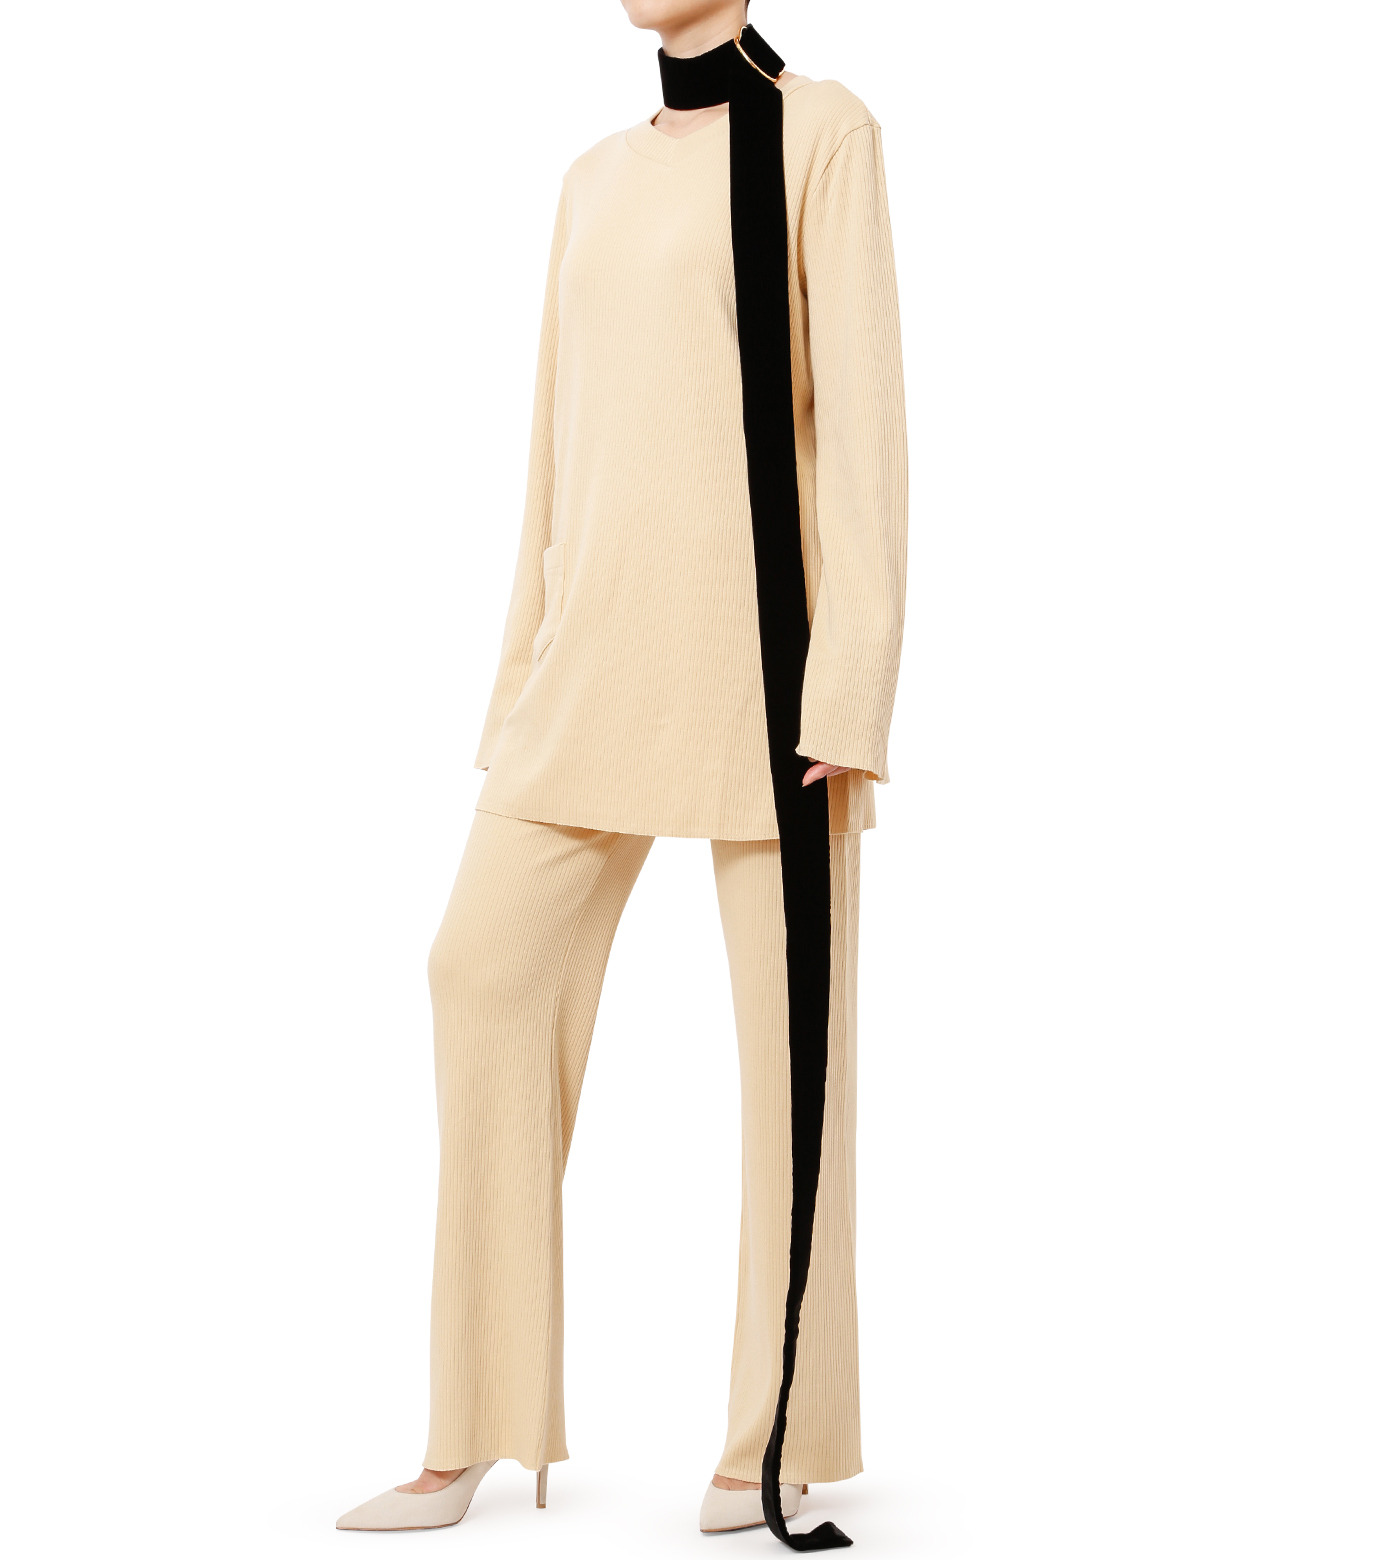 AKANE UTSUNOMIYA(アカネウツノミヤ)のLong Sleeve Rib Knit Pullover-LIGHT BEIGE(ニット/knit)-W16FCT032001-51 拡大詳細画像3